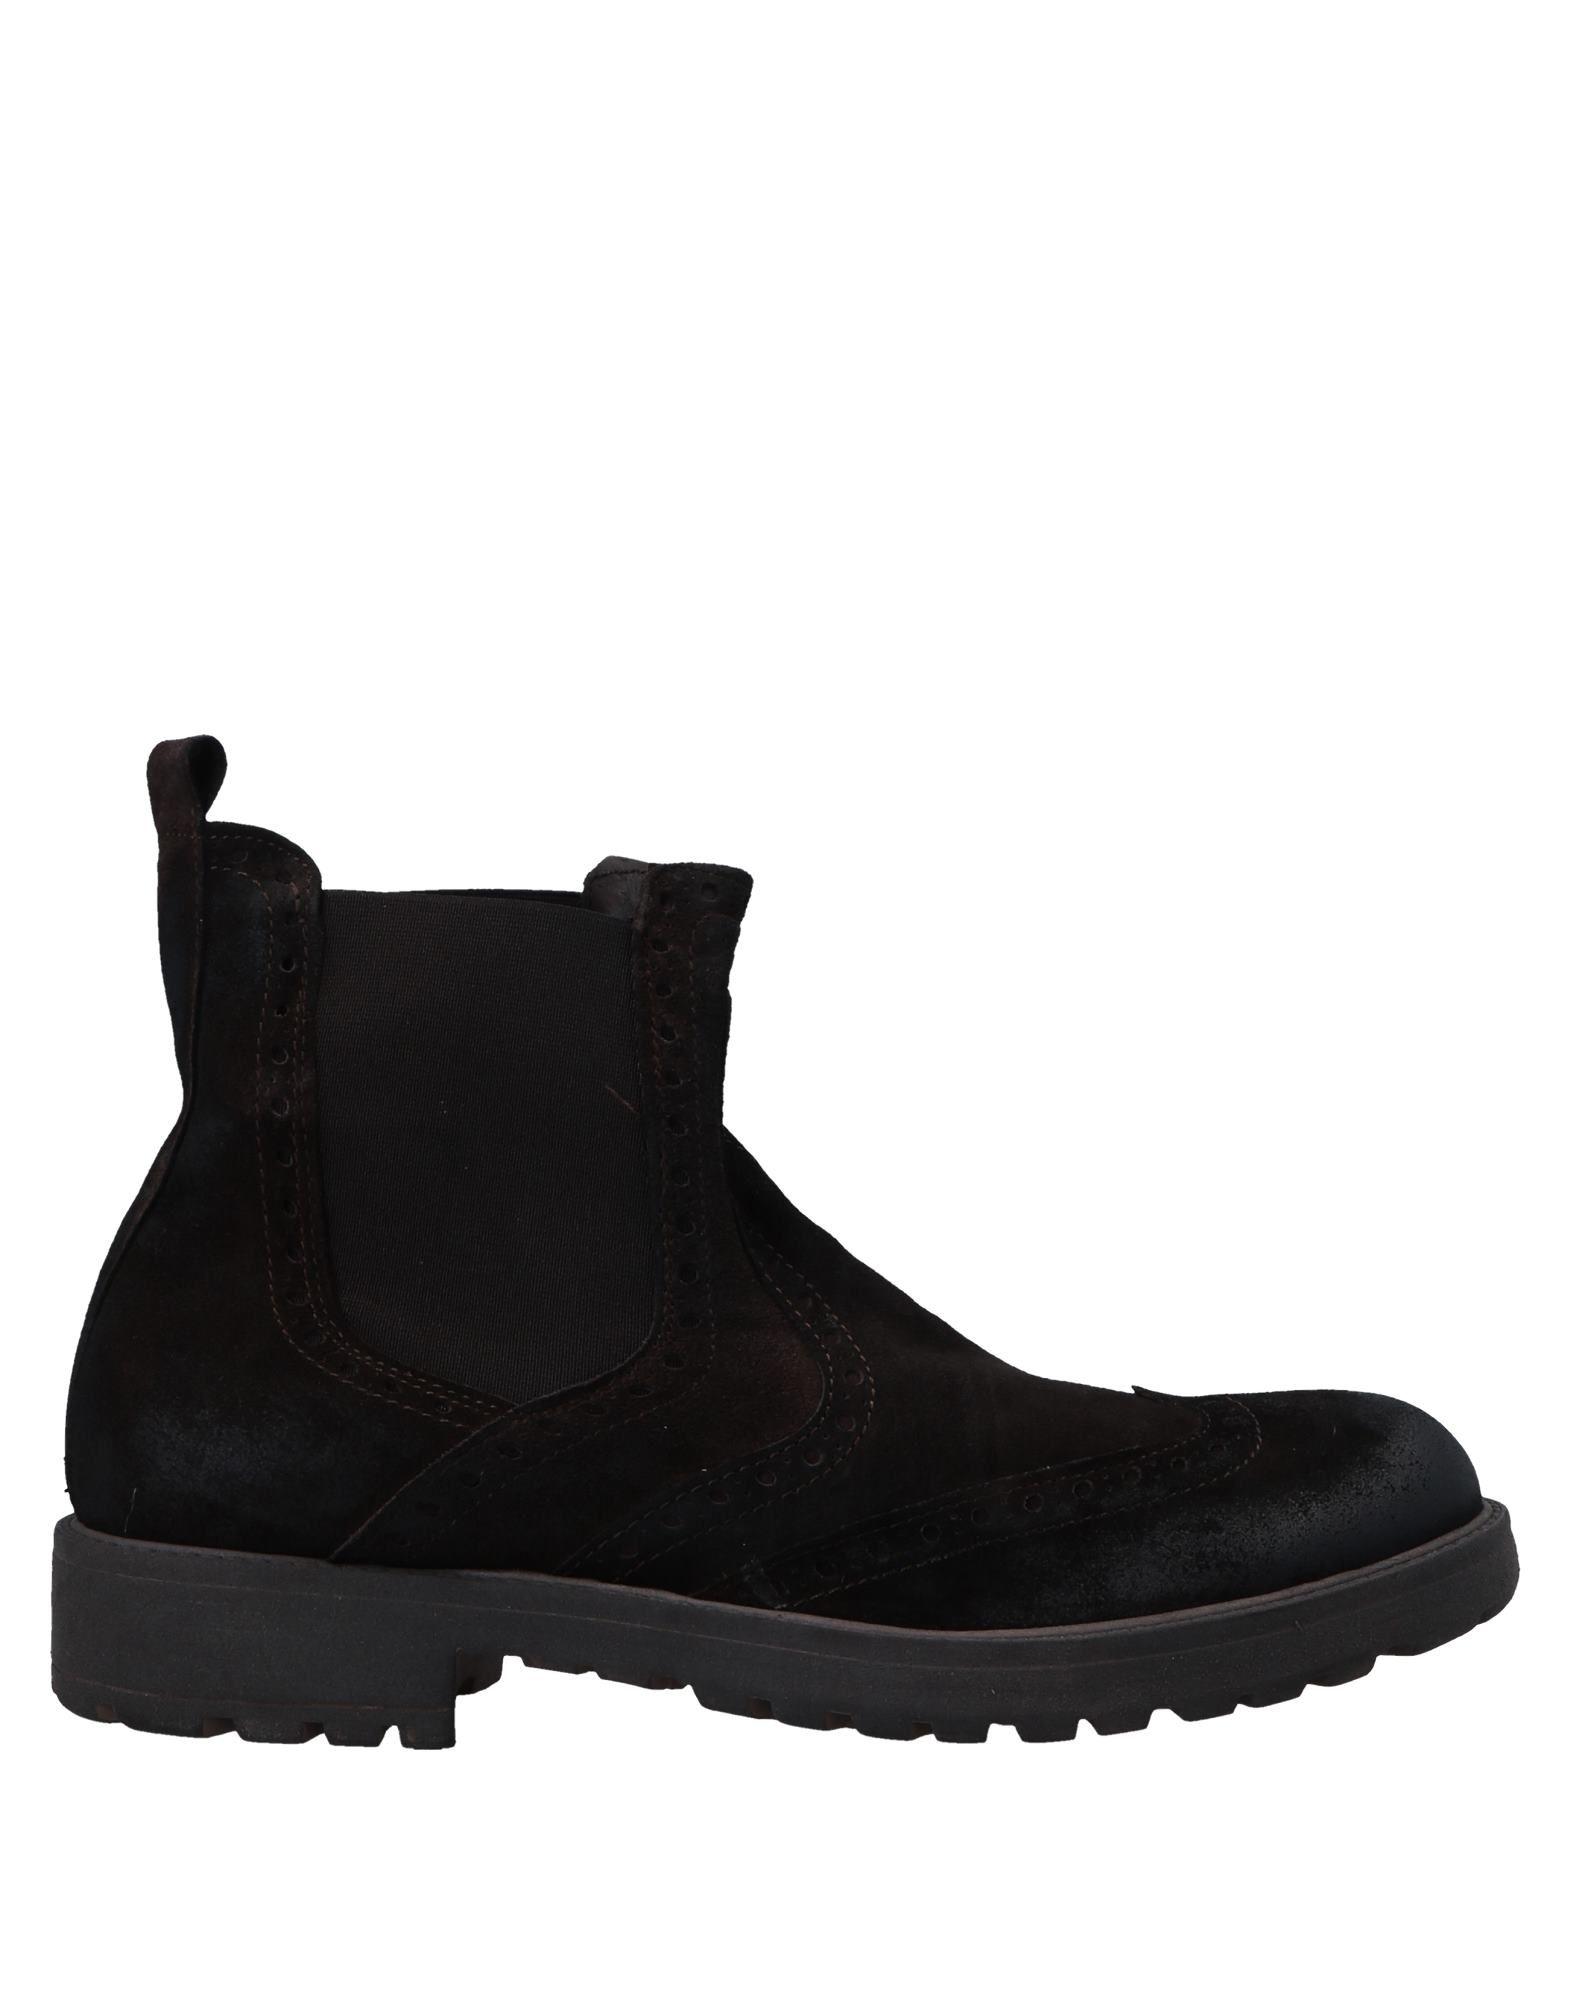 BRUNO VERRI Полусапоги и высокие ботинки bruno bonelli полусапоги и высокие ботинки